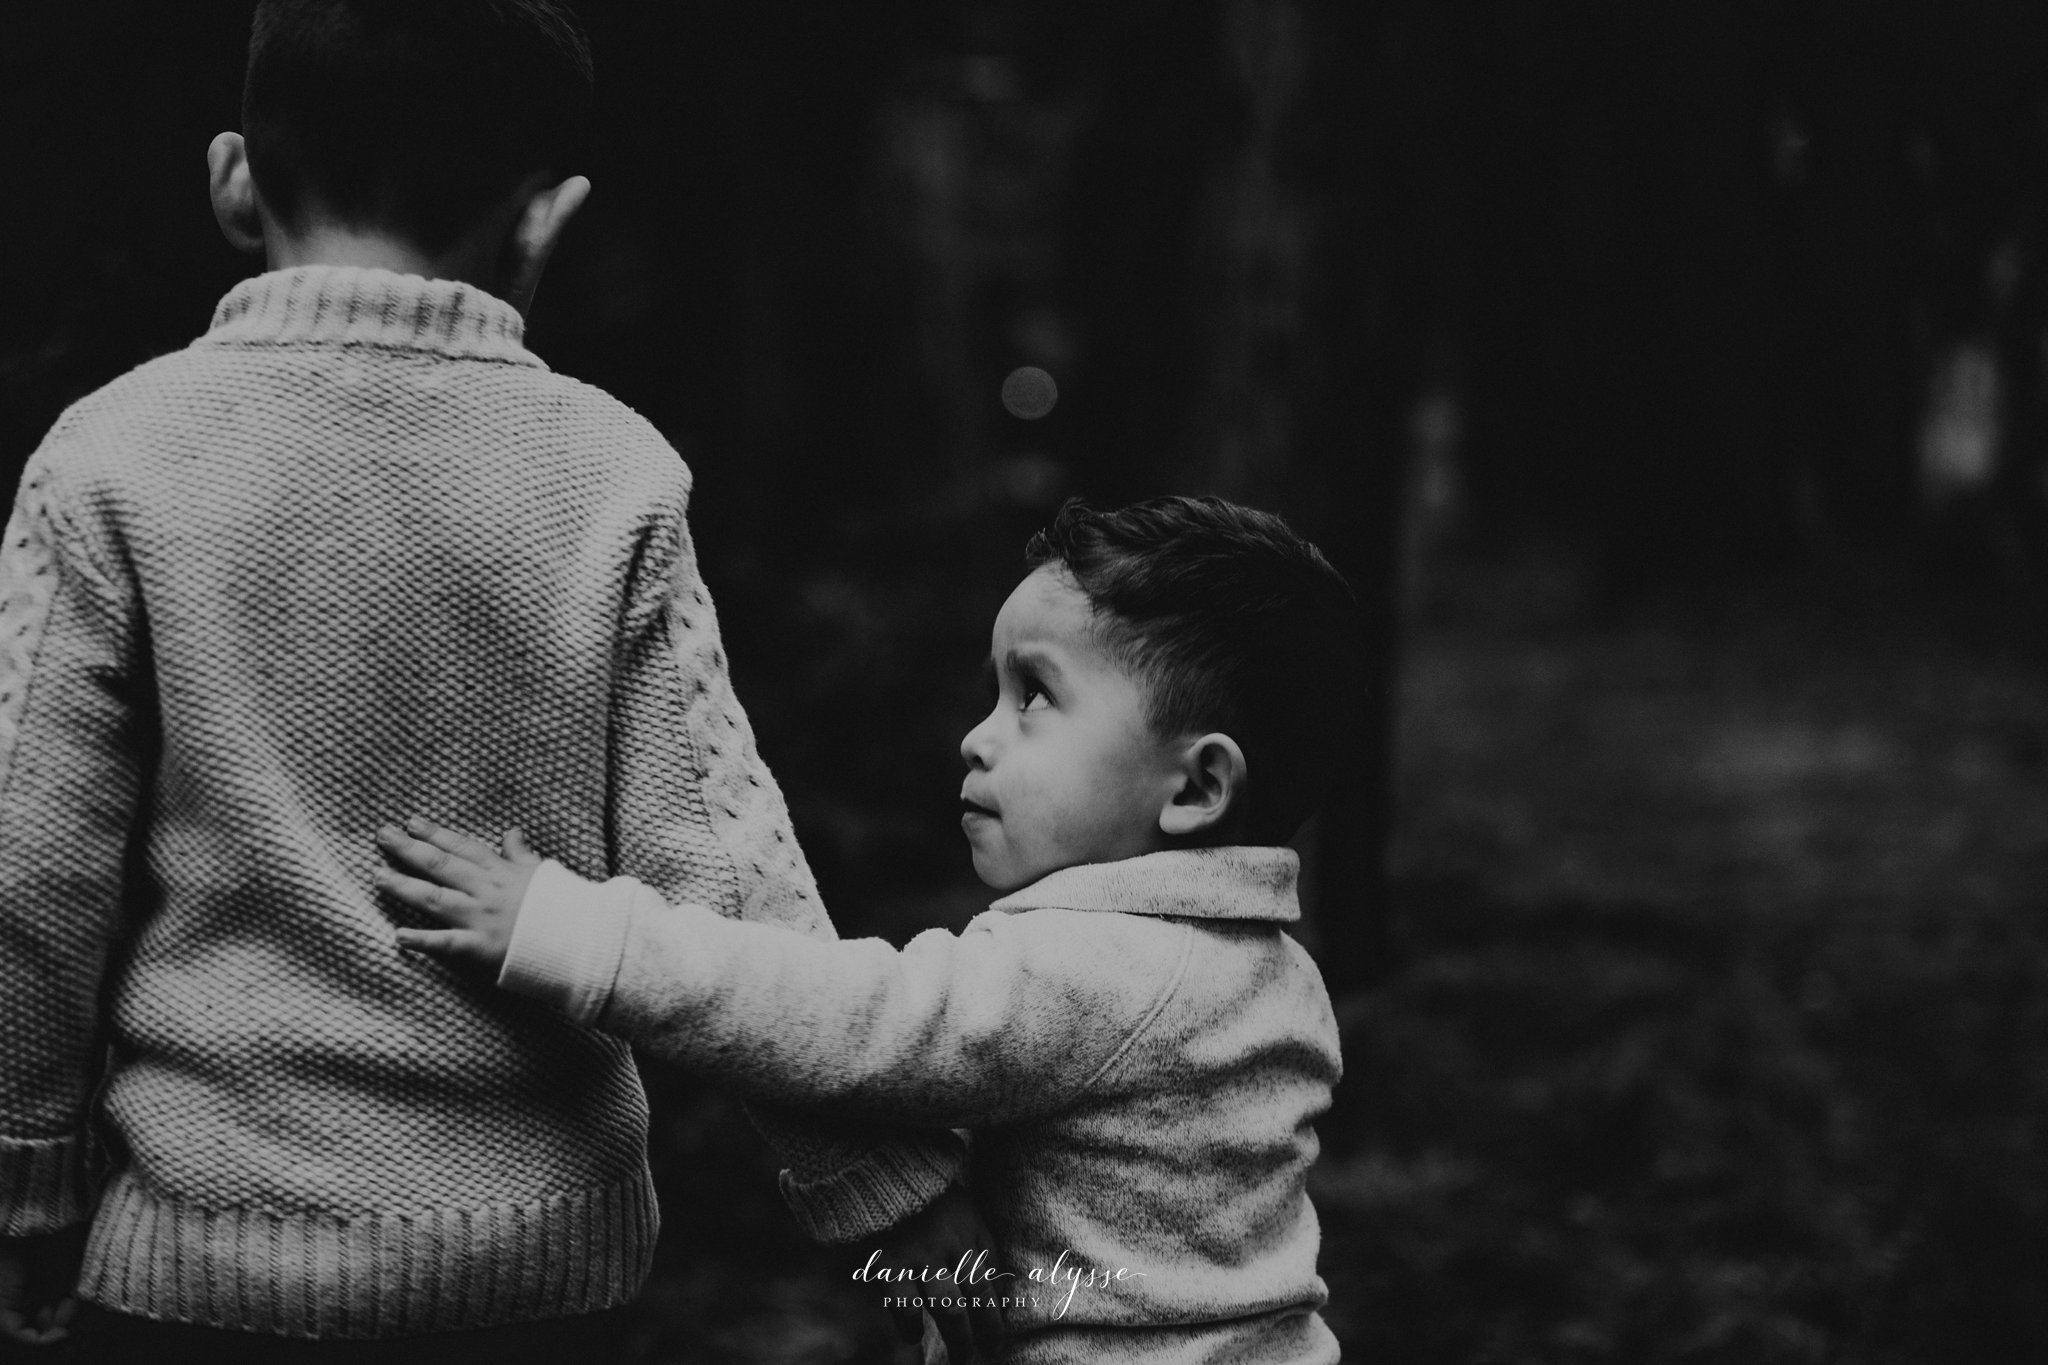 181205_family_portrait_fall_davis_arboretum_andrea_danielle_alysse_photography_20_WEB.jpg